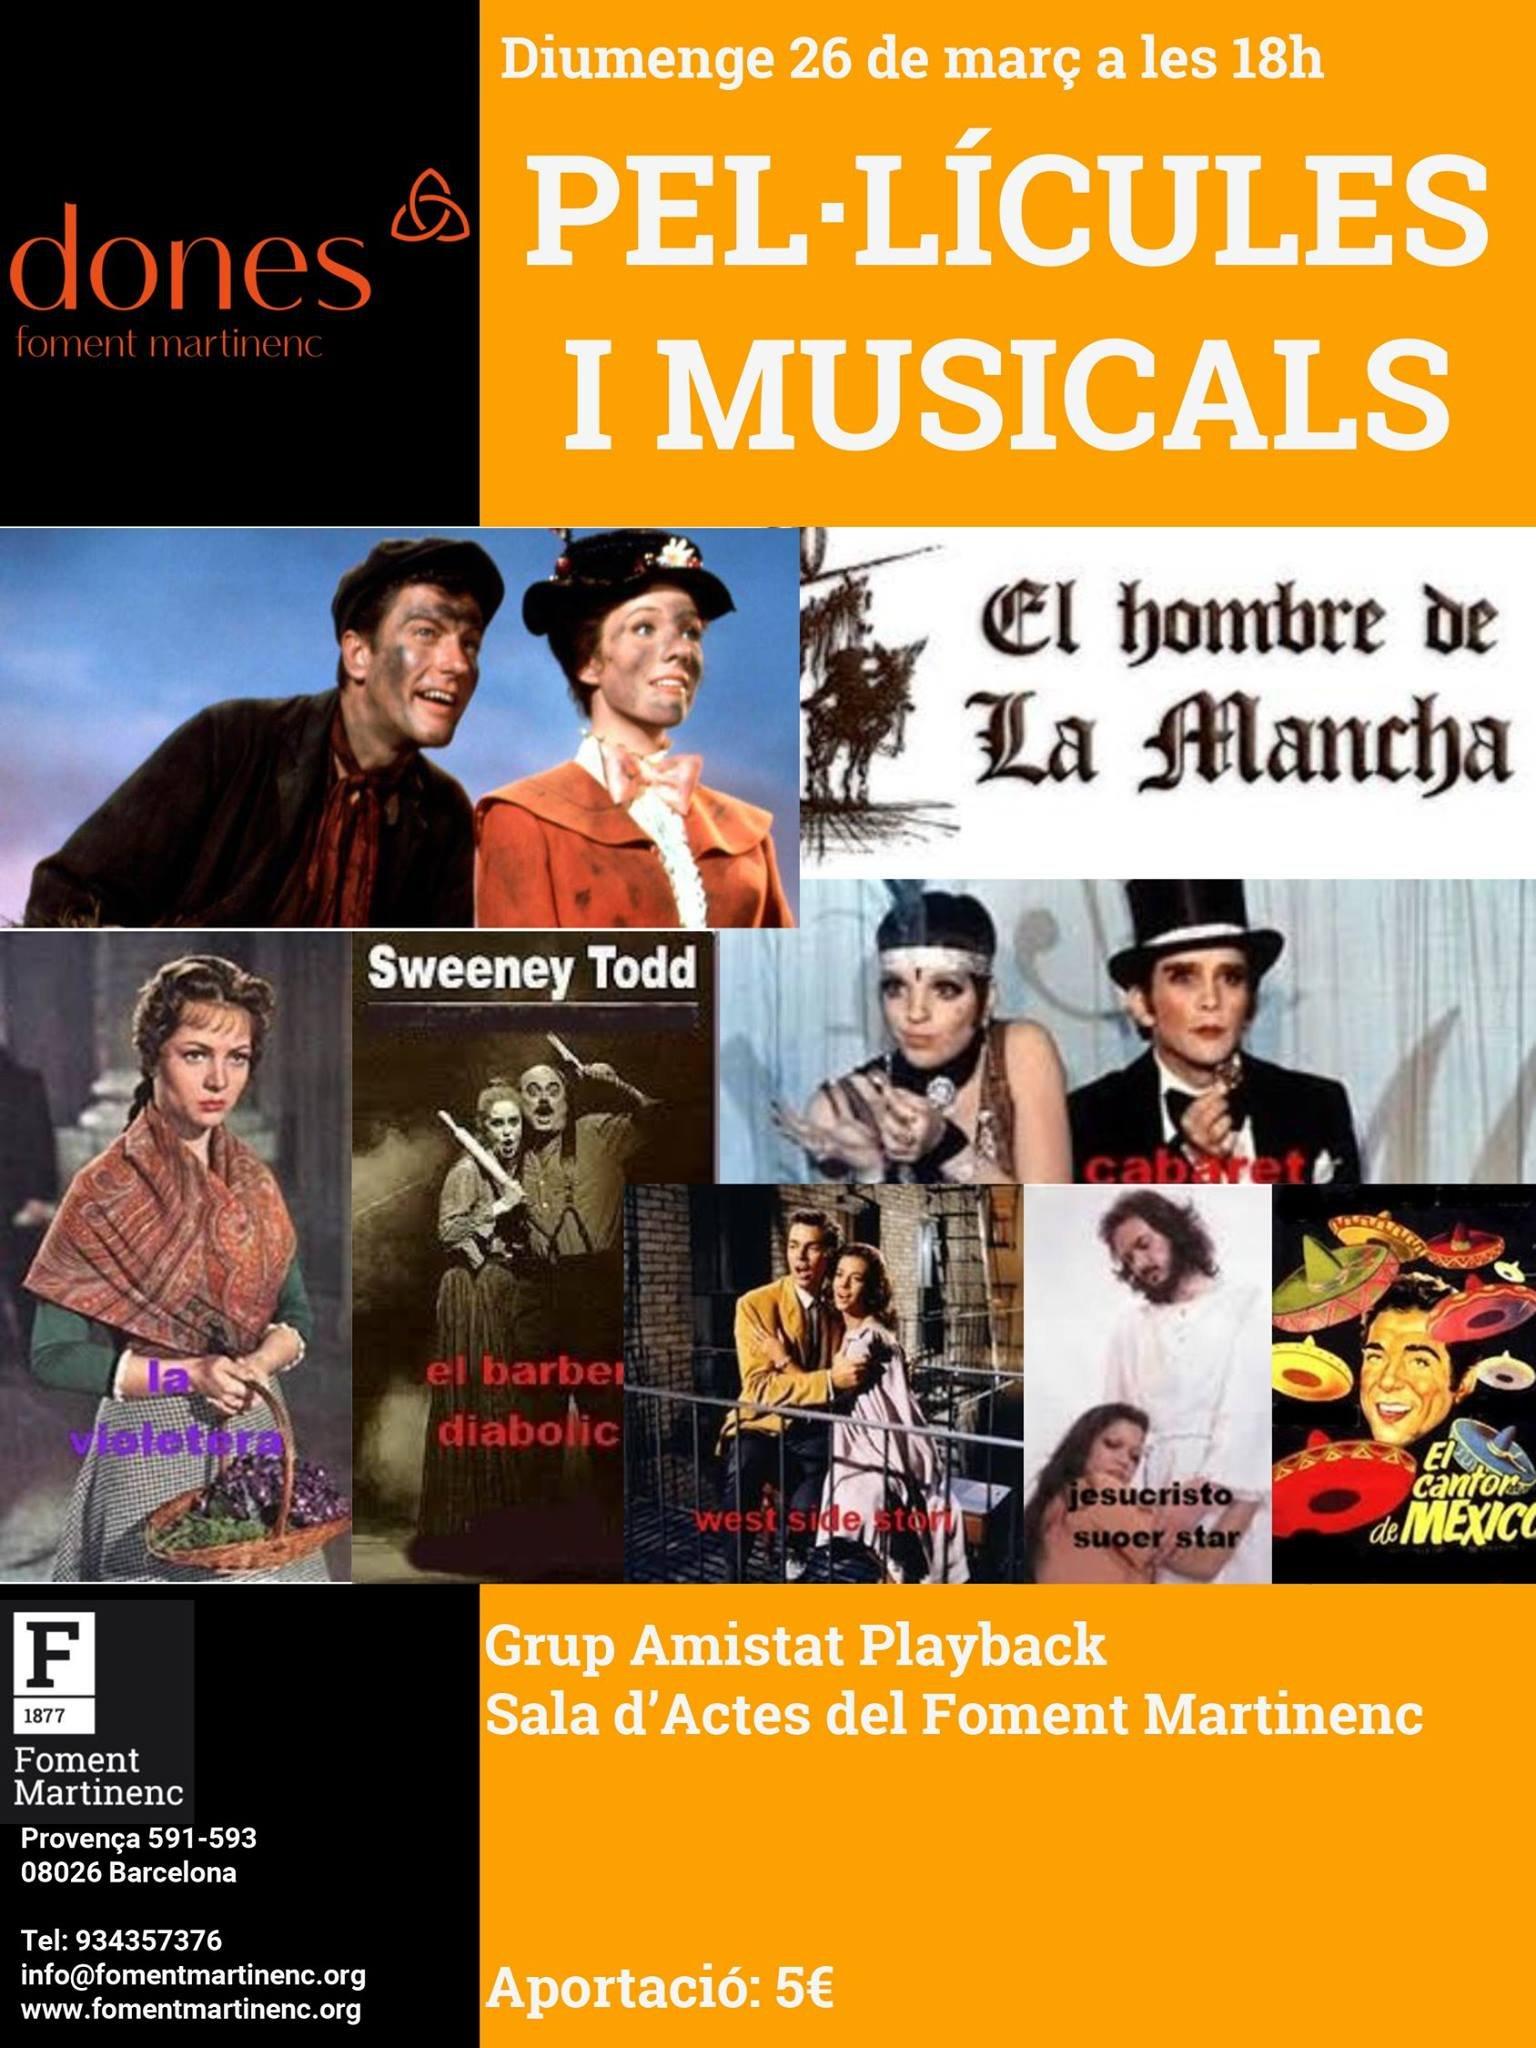 20170326_musicals